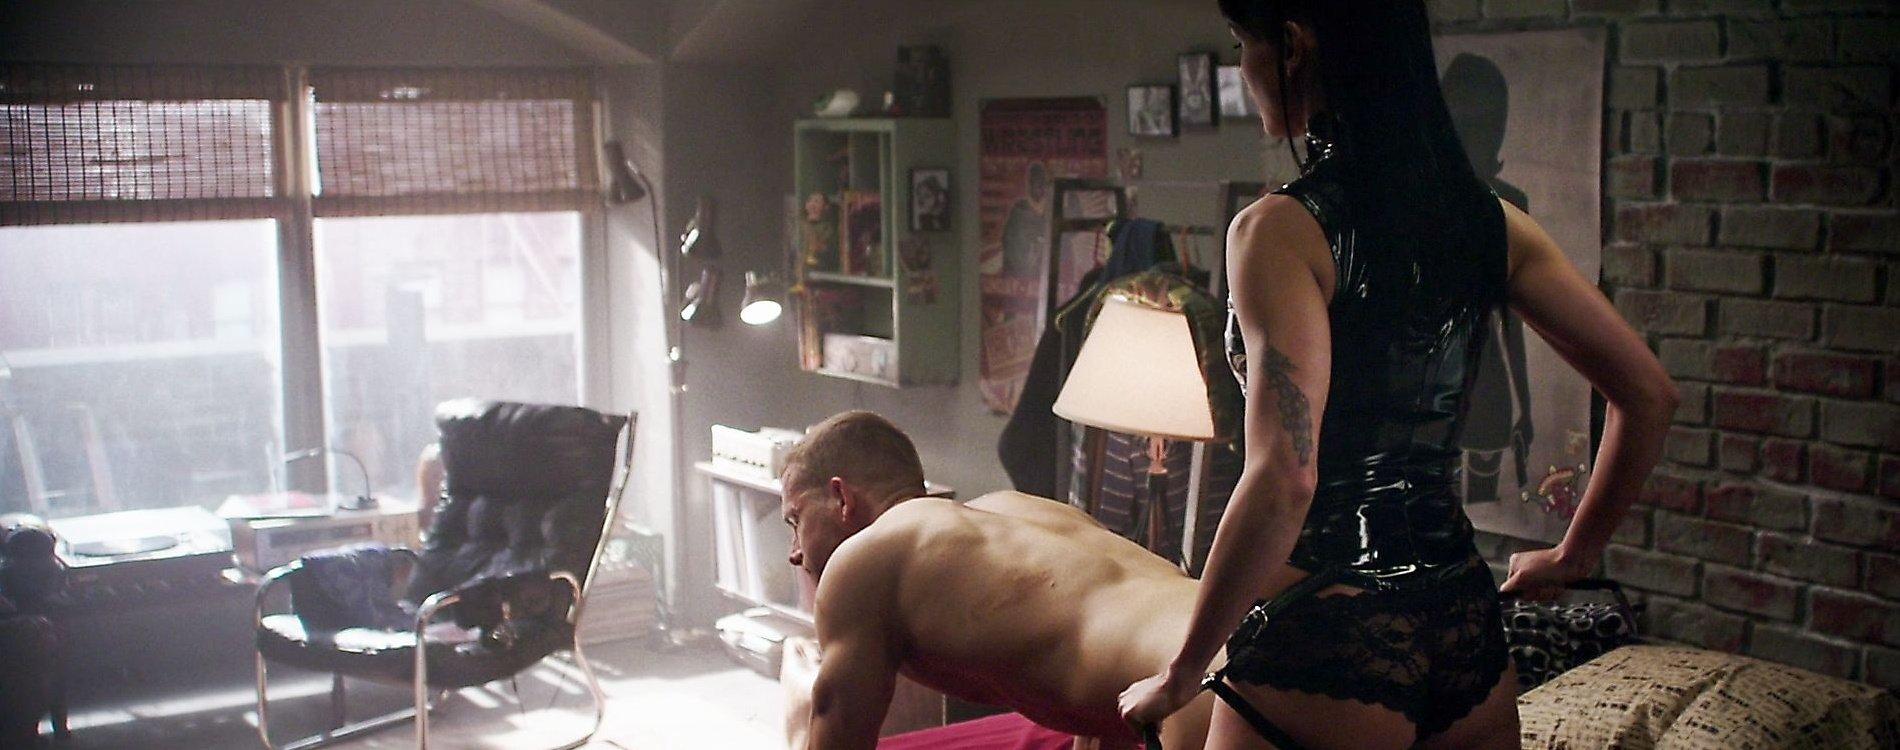 Morena baccarin deadpool sex scene